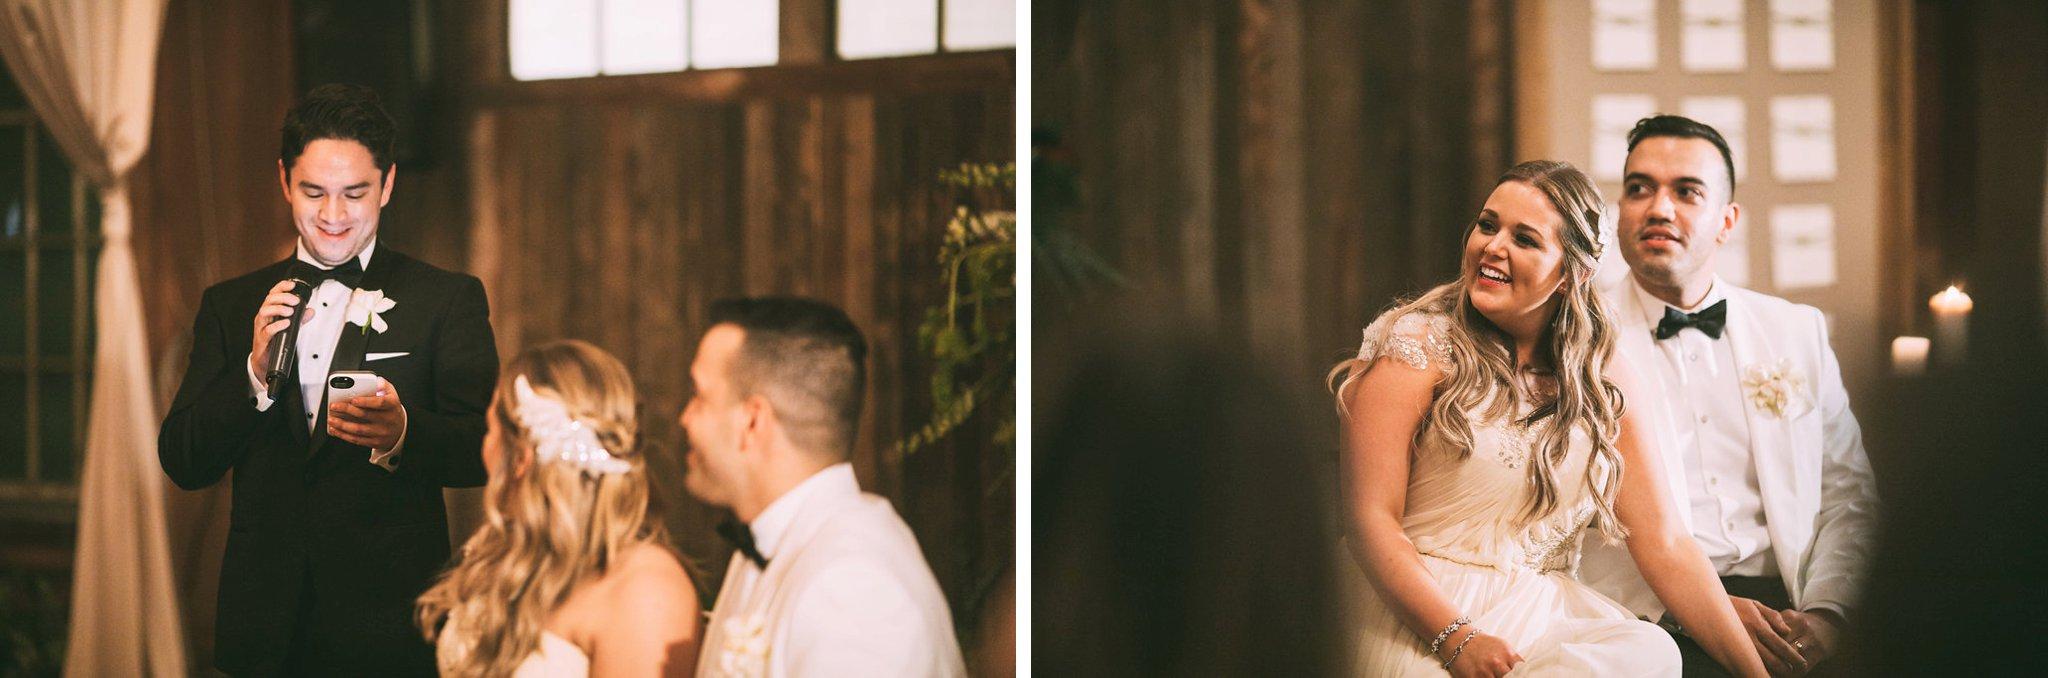 New Year's Eve Feminist Brazilian Wedding Photography Seattle Washington Carly Romeo Photography Richmond VA Best Man Toast Laugh